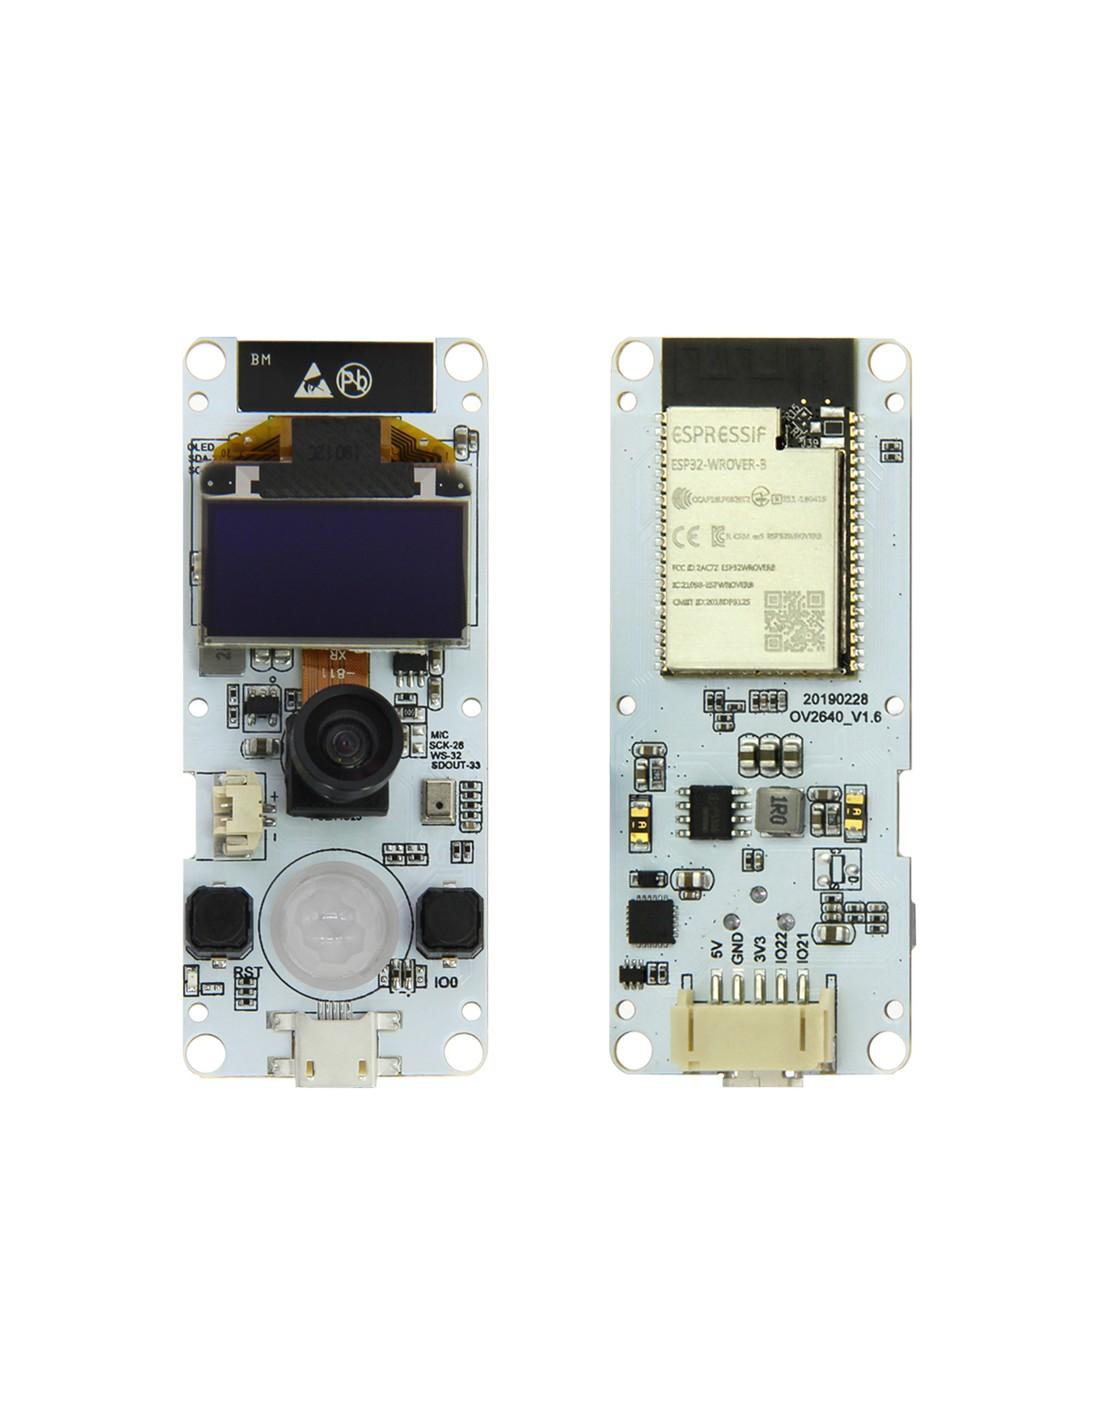 TTGO T-Camera ESP32 WROVER Wifi / BT Camera Module, ESP32 + OV2640 + PIR